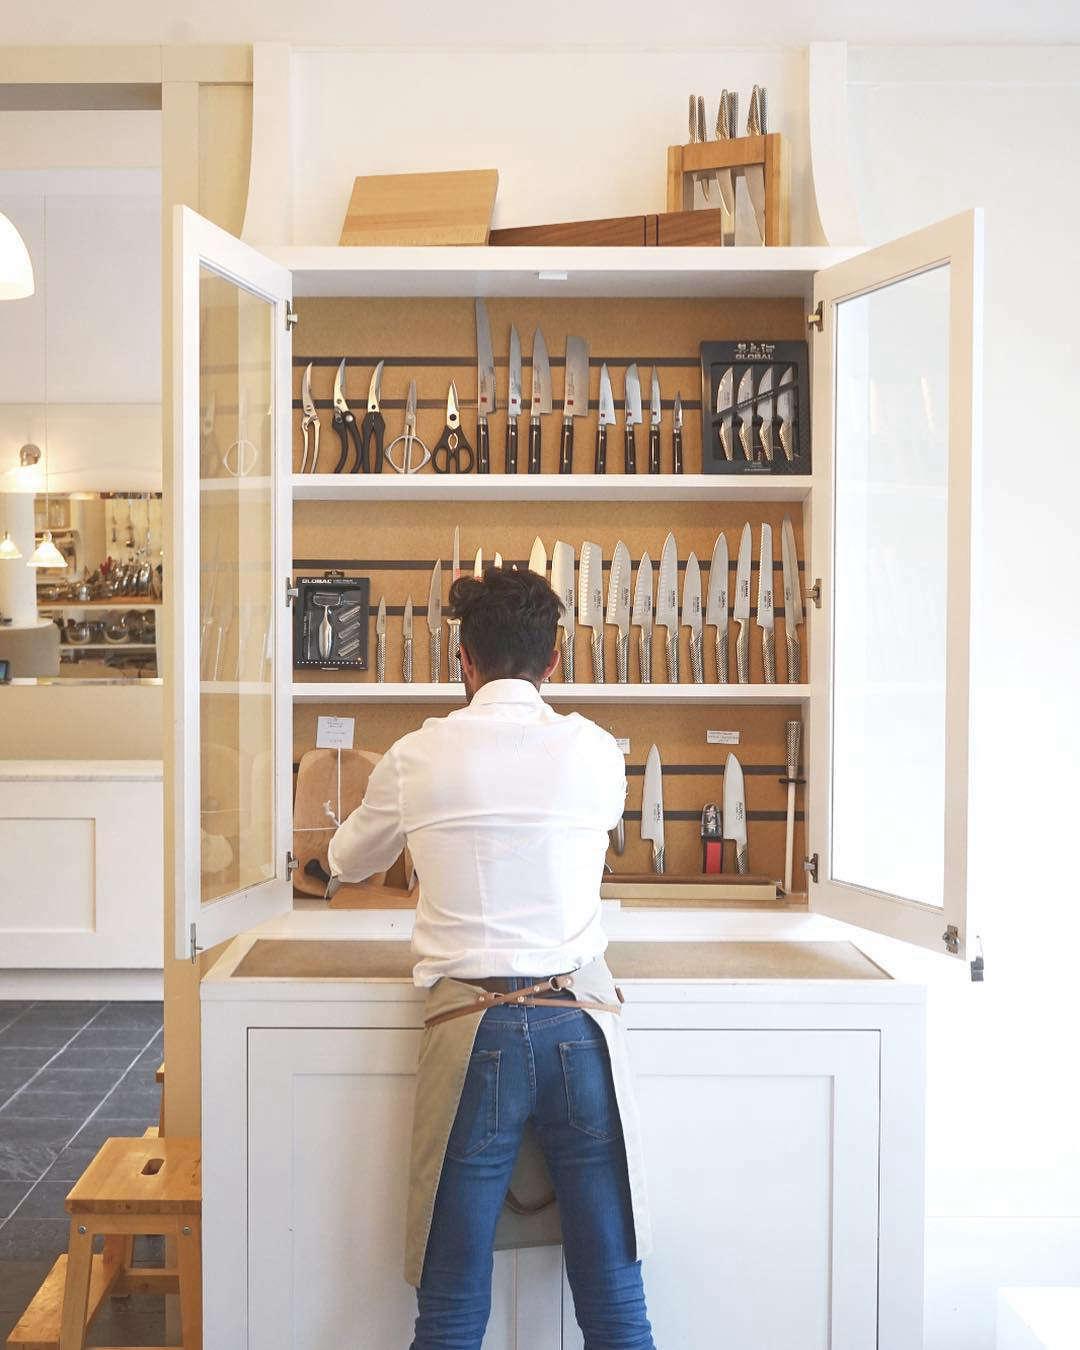 Les Touilleurs: A Classic Kitchen Emporium in Montreal - Remodelista